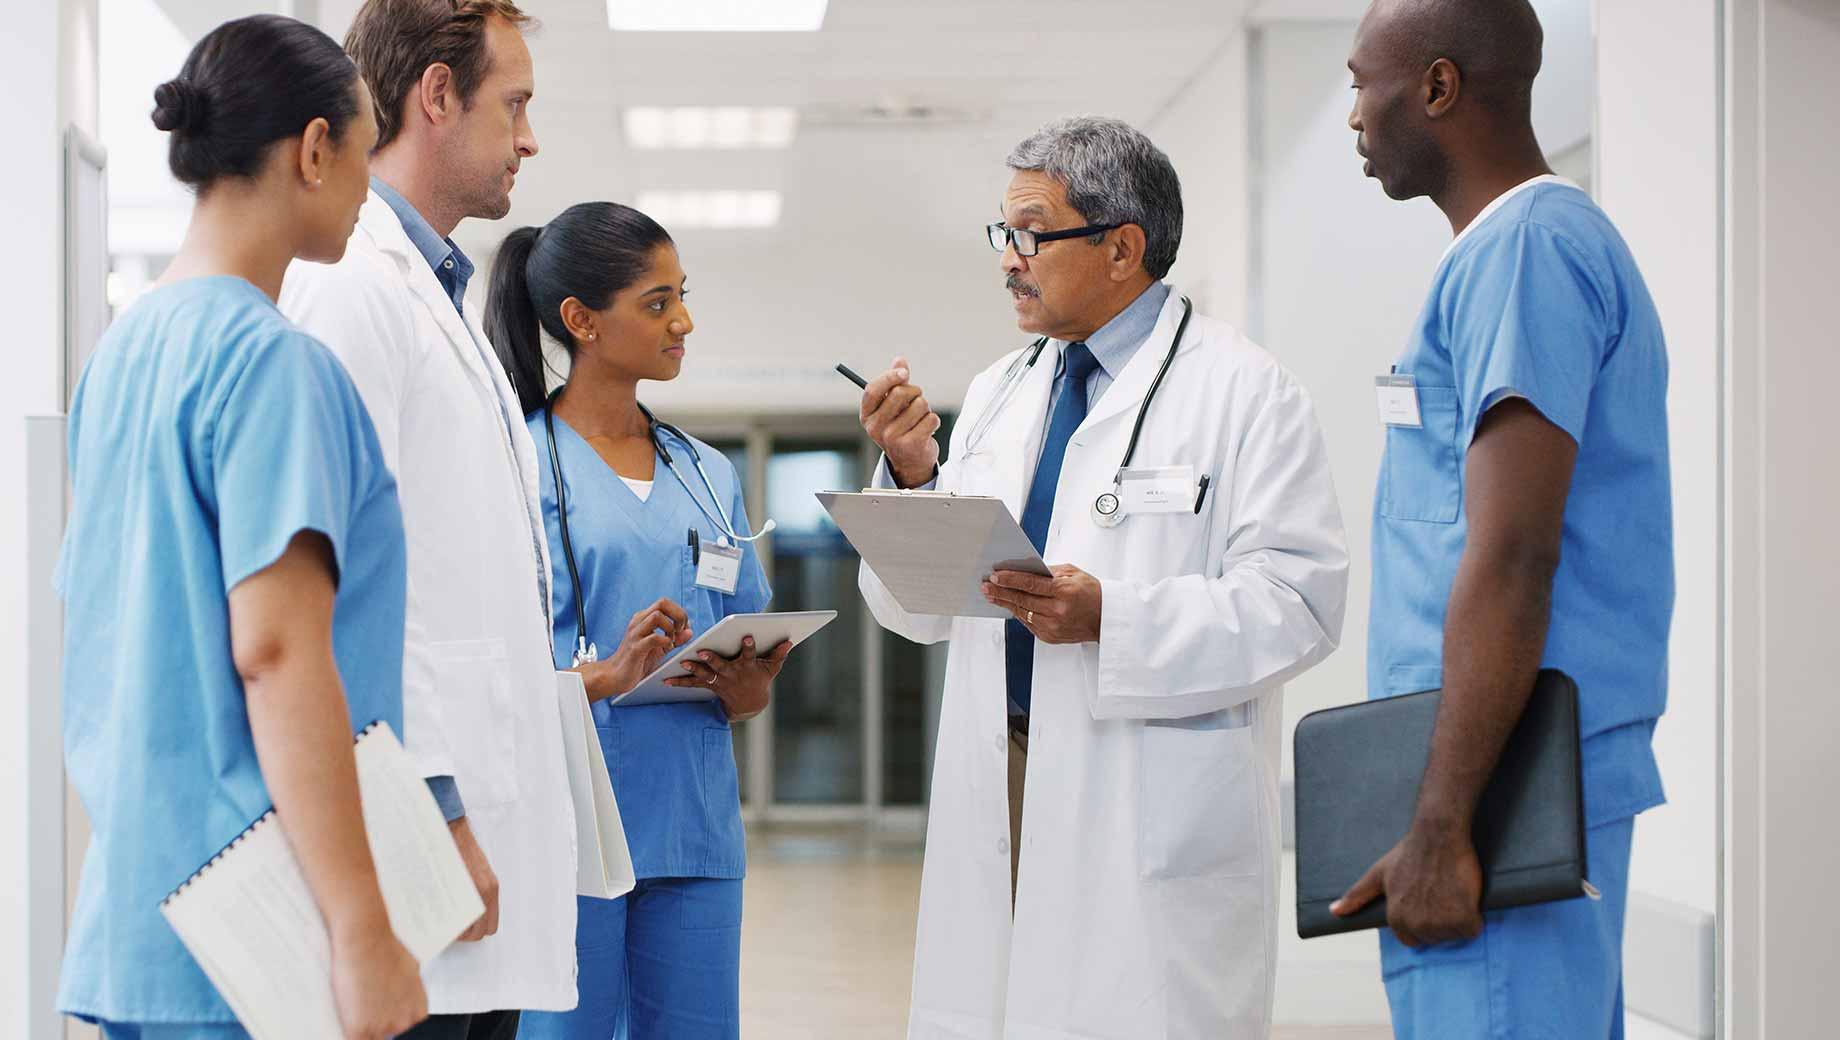 Chemistry Careers in Healthcare